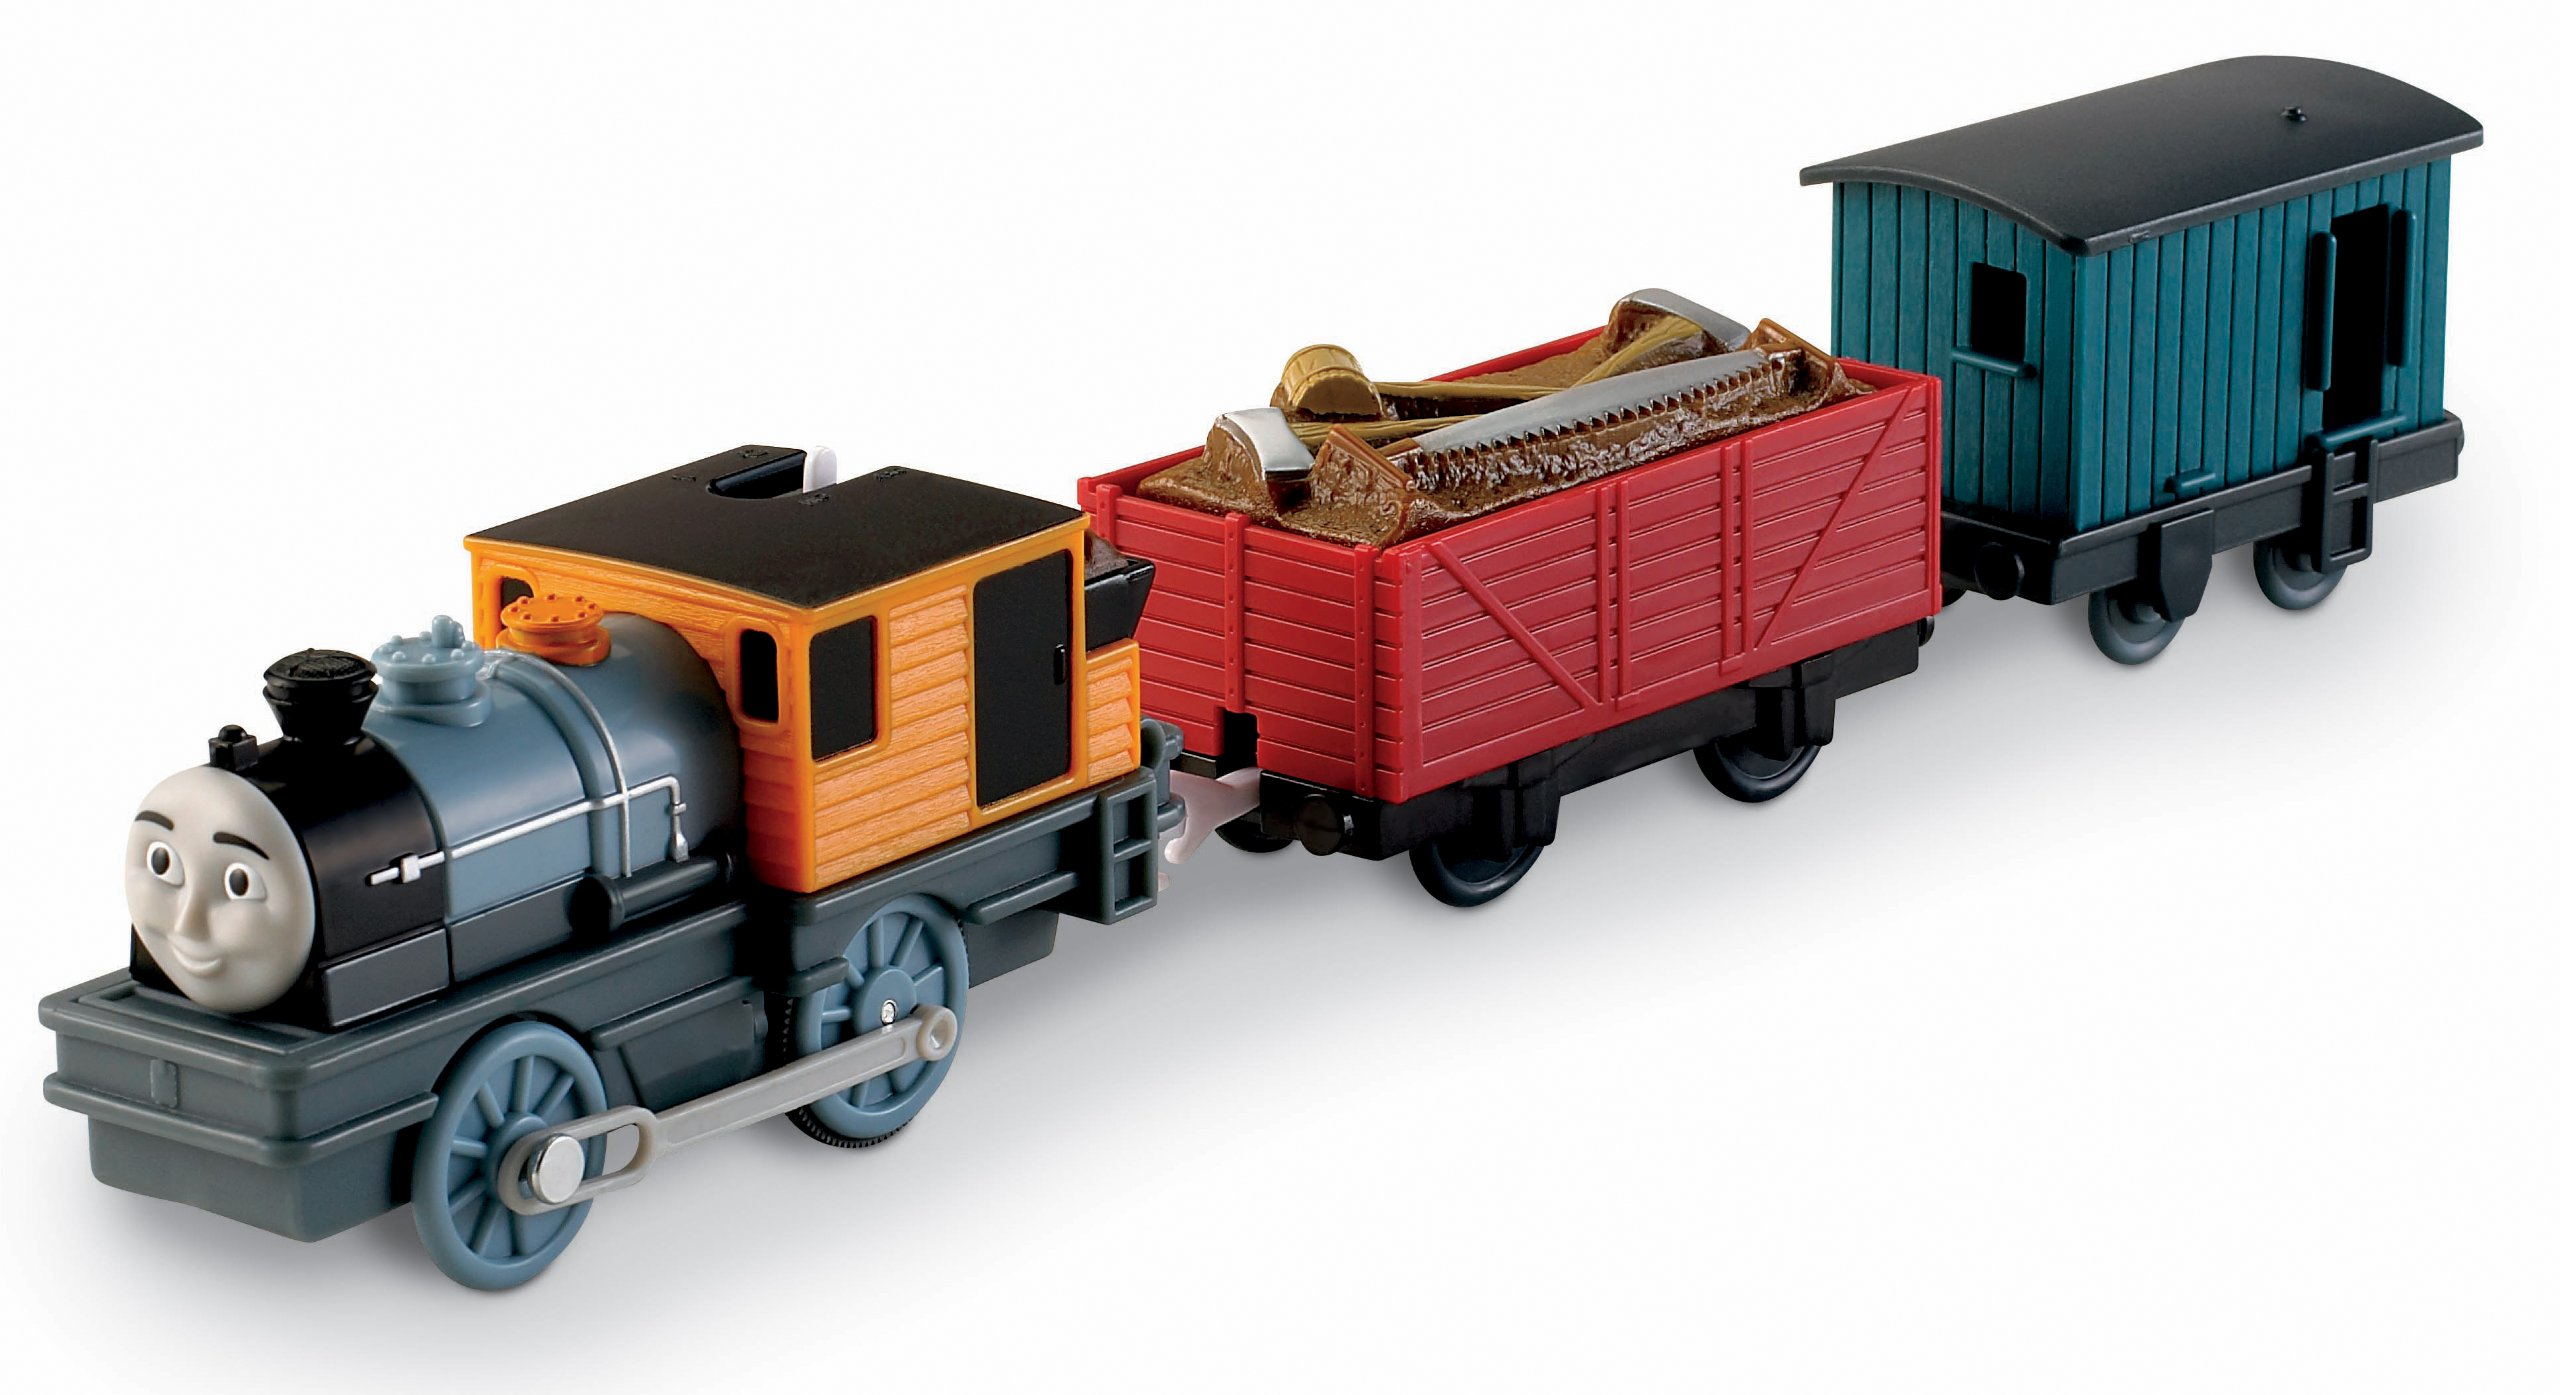 Thomas & Friends TrackMaster, Bash the Logging Loco